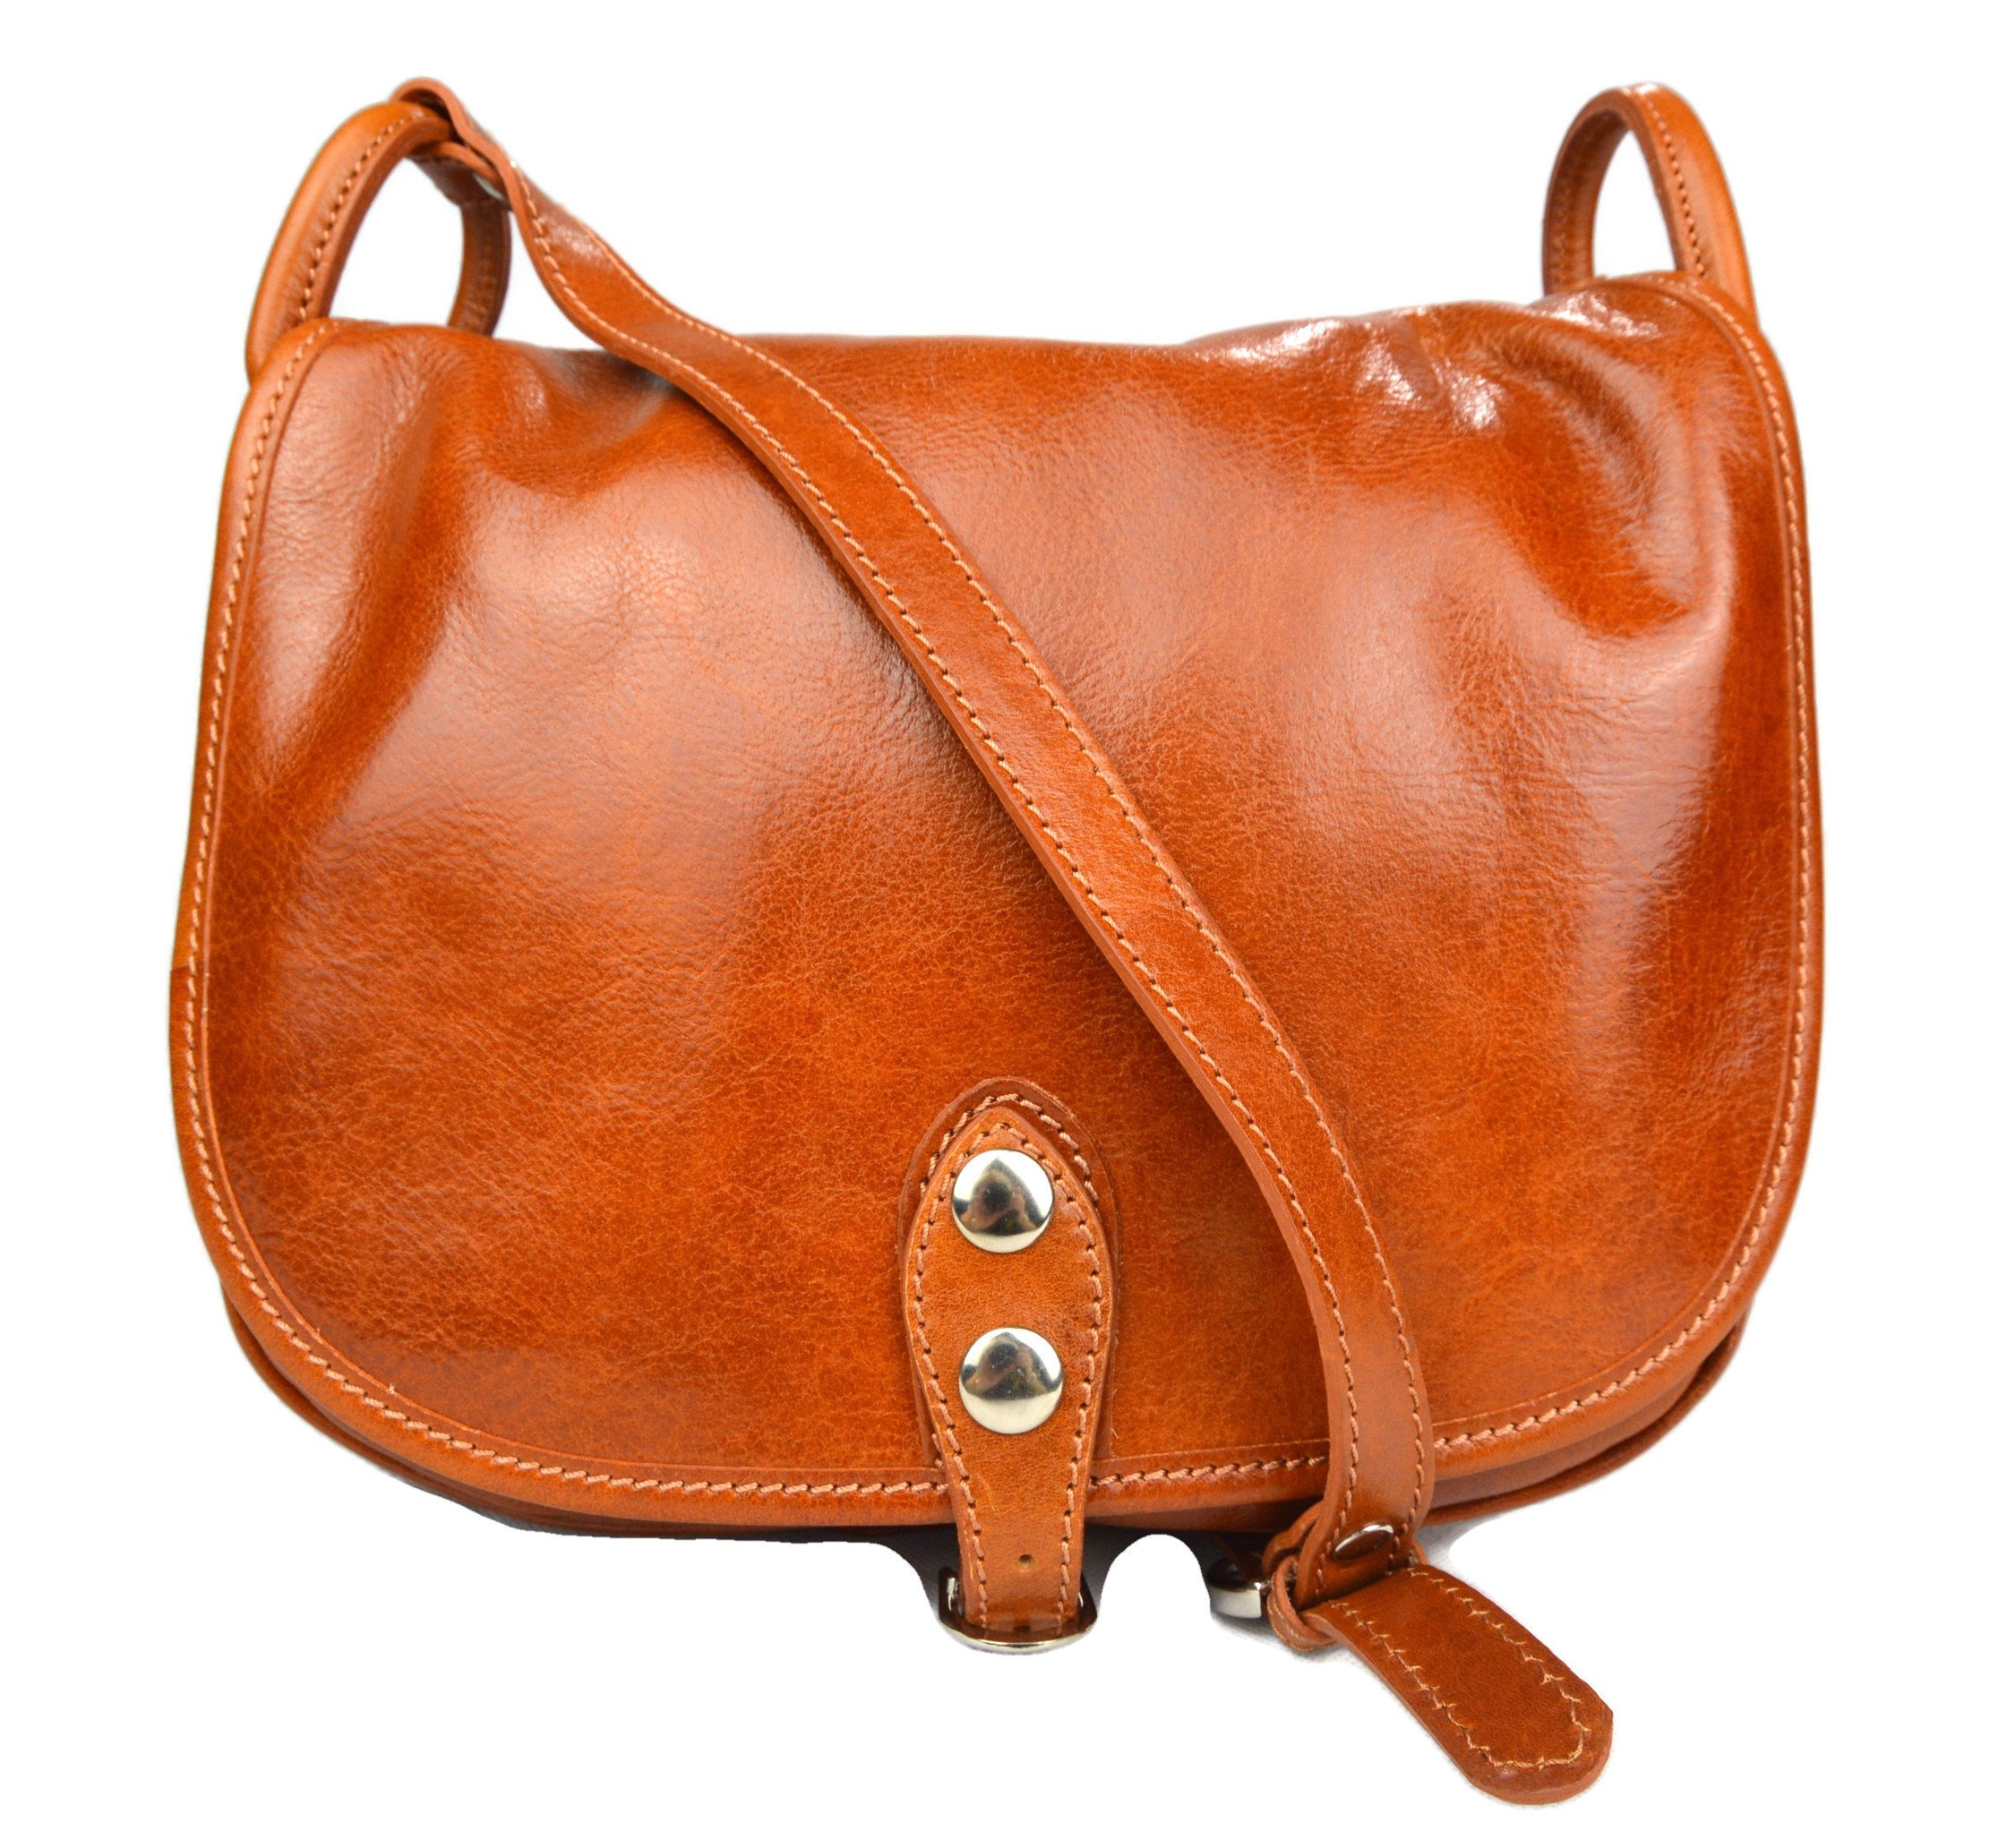 Ladies handbag leather bag clutch hobo bag shoulder bag brown crossbody bag honey black made in Italy genuine leather